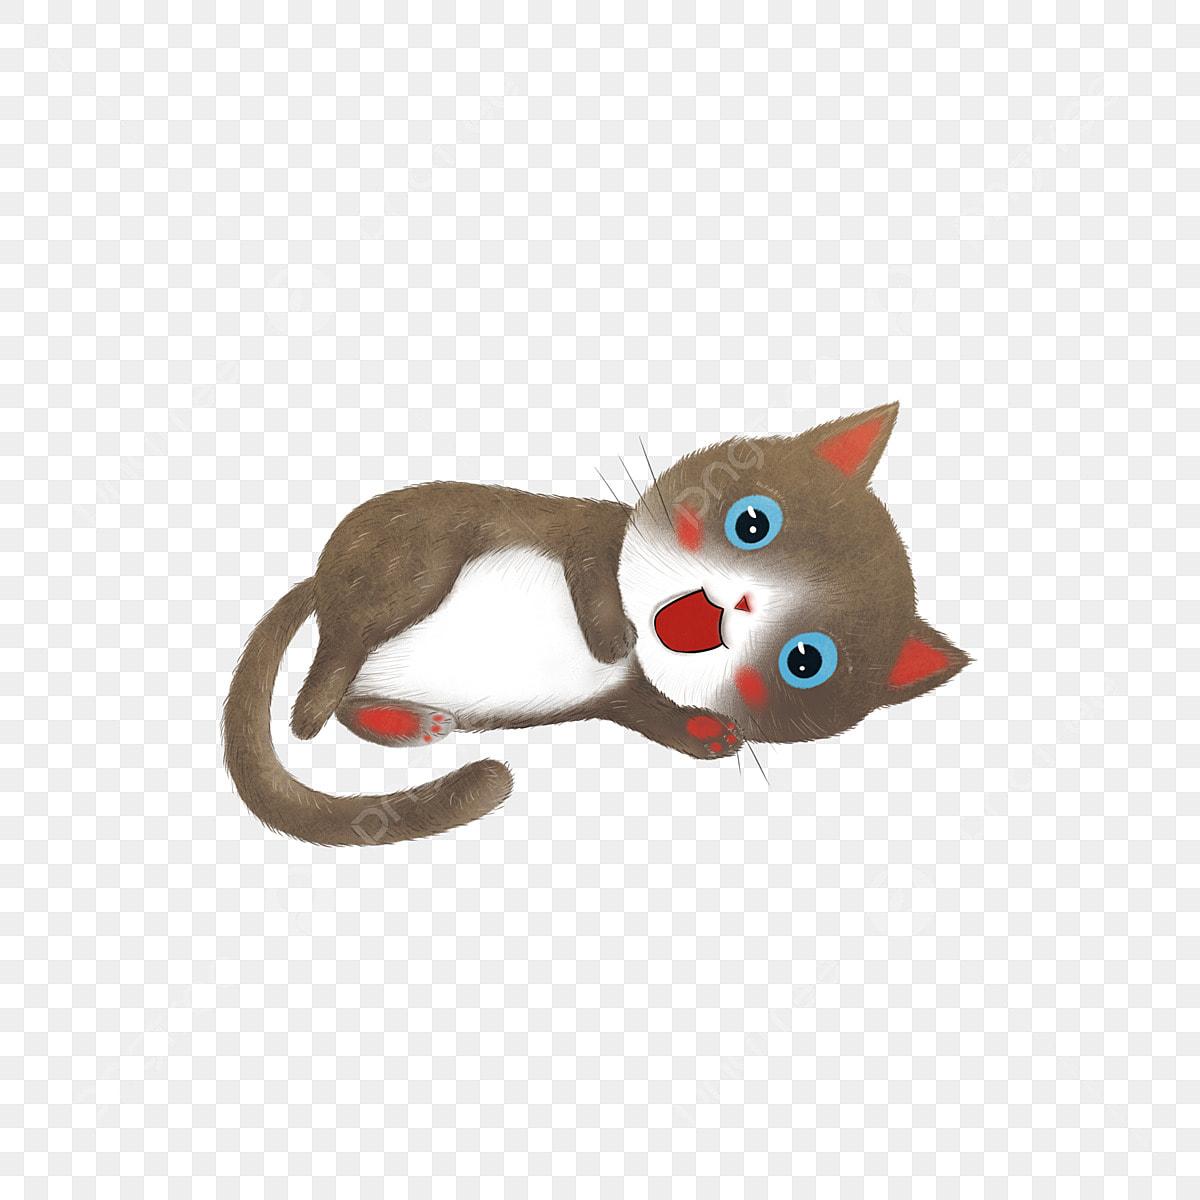 Download 95+  Gambar Kucing Lucu Cartoon Paling Baru Gratis